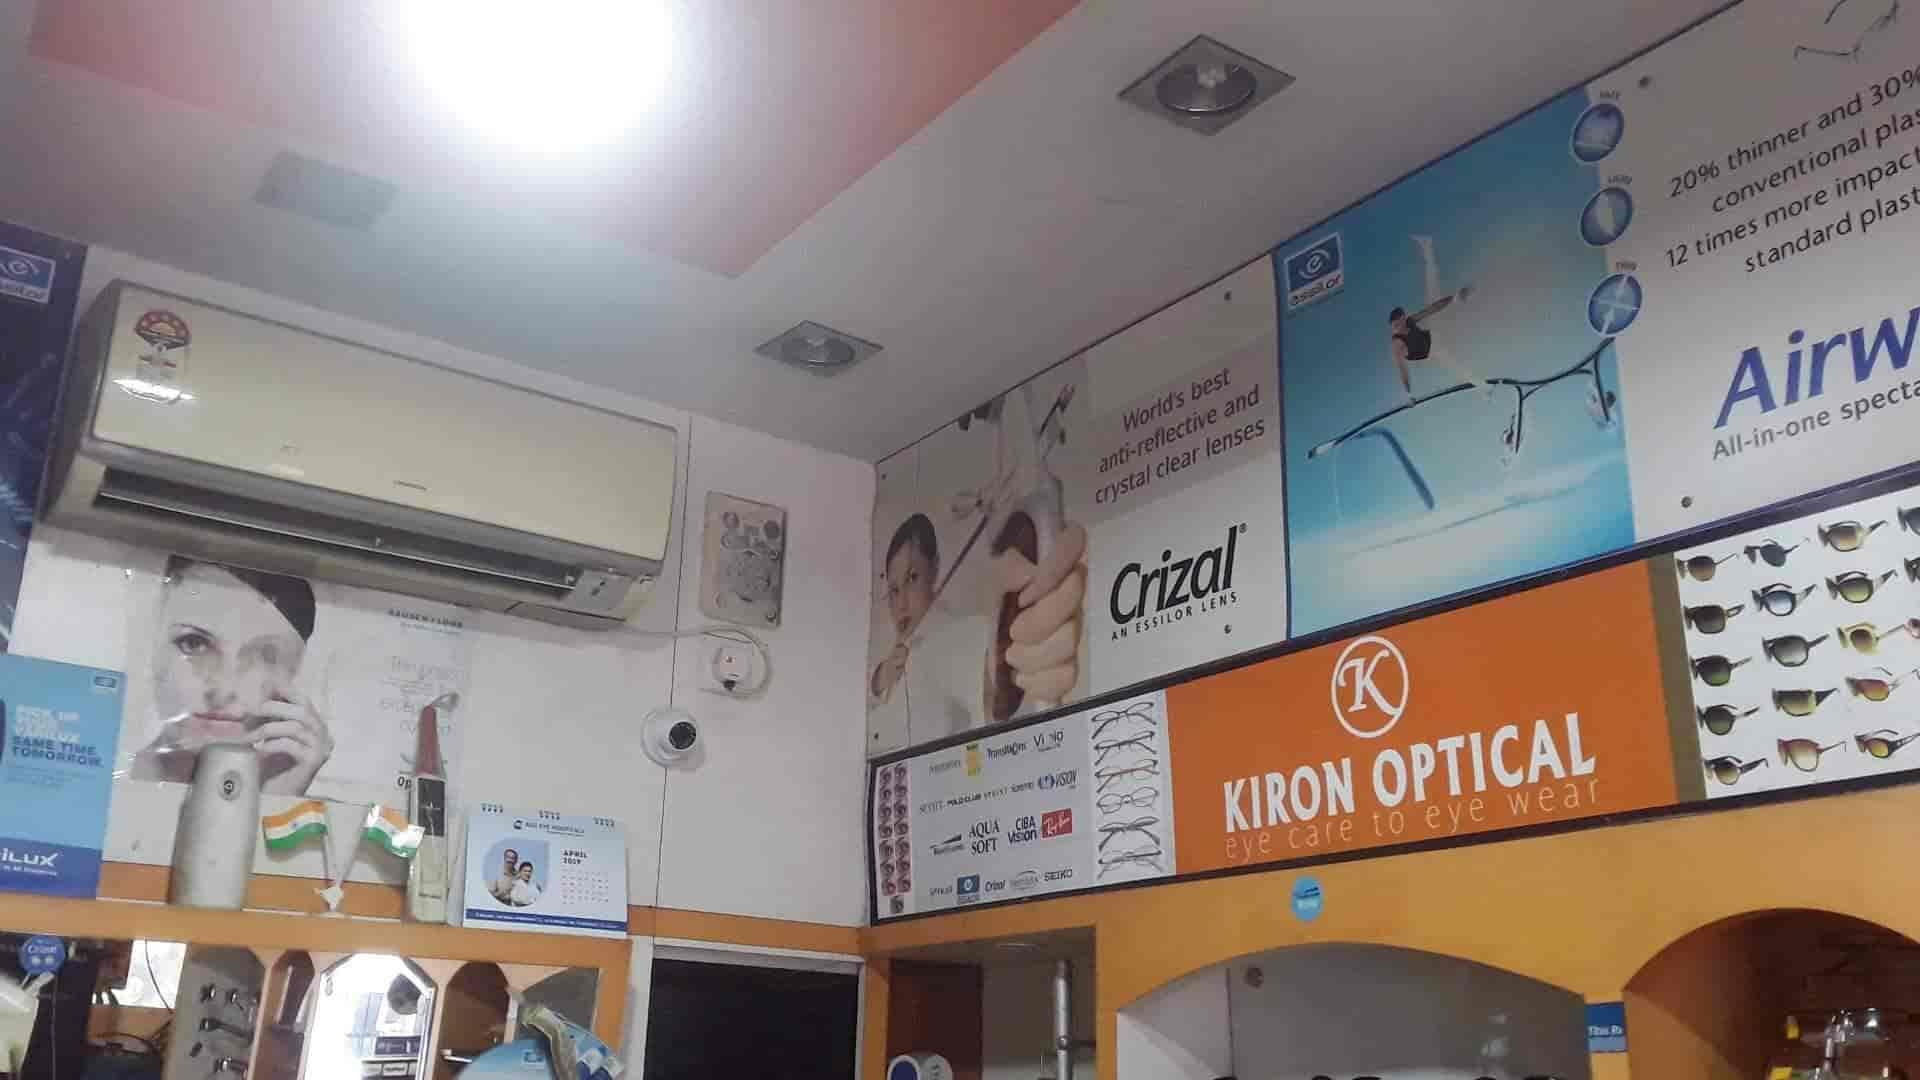 Kiron Optical, Birati - Opticians in Kolkata - Justdial